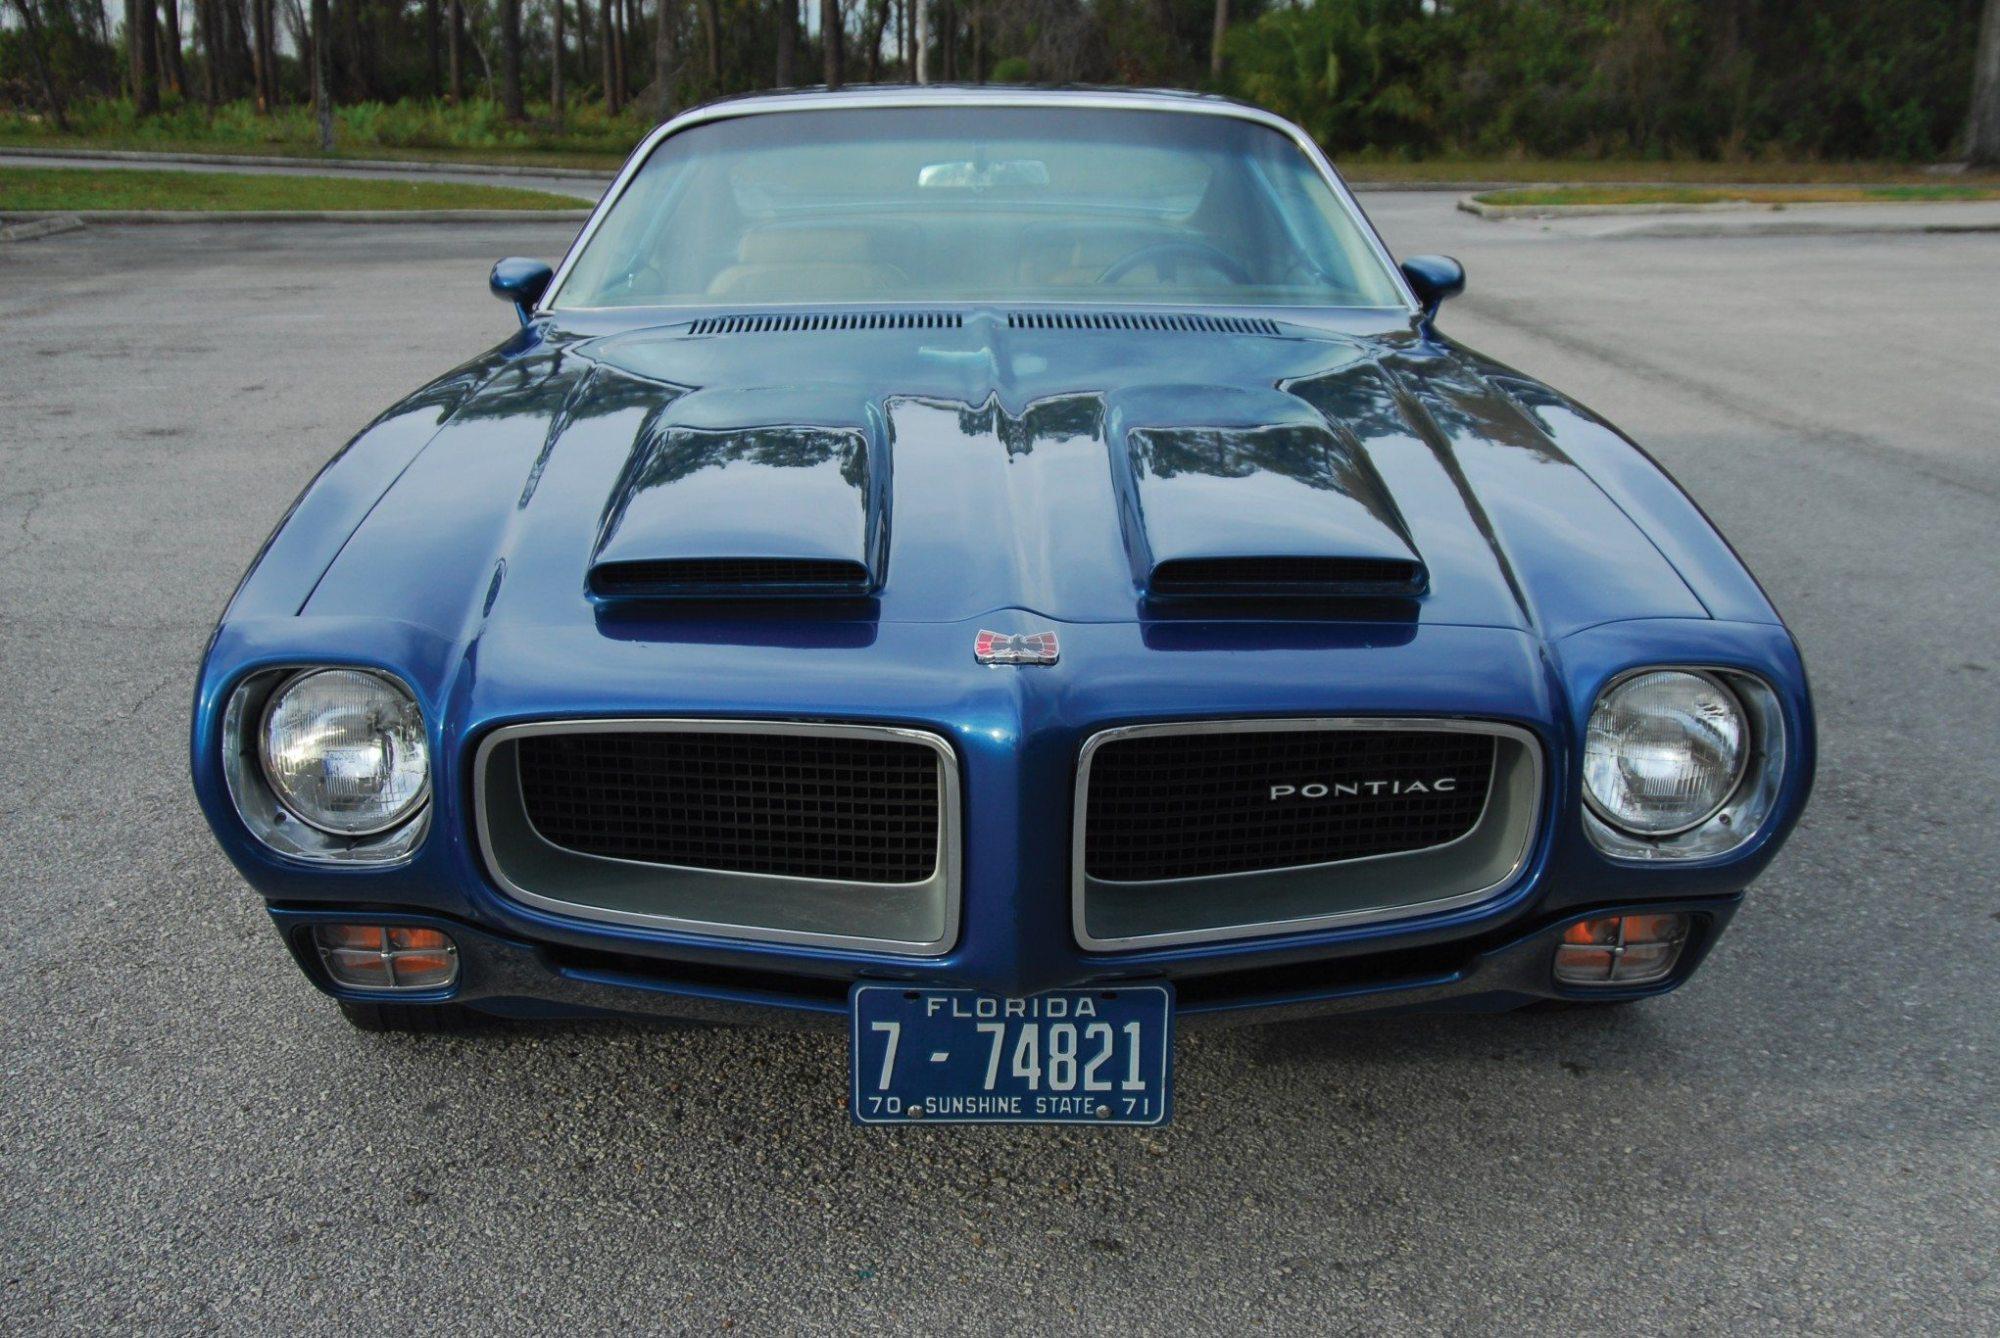 hight resolution of 1970 pontiac firebird formula 400 front and hood